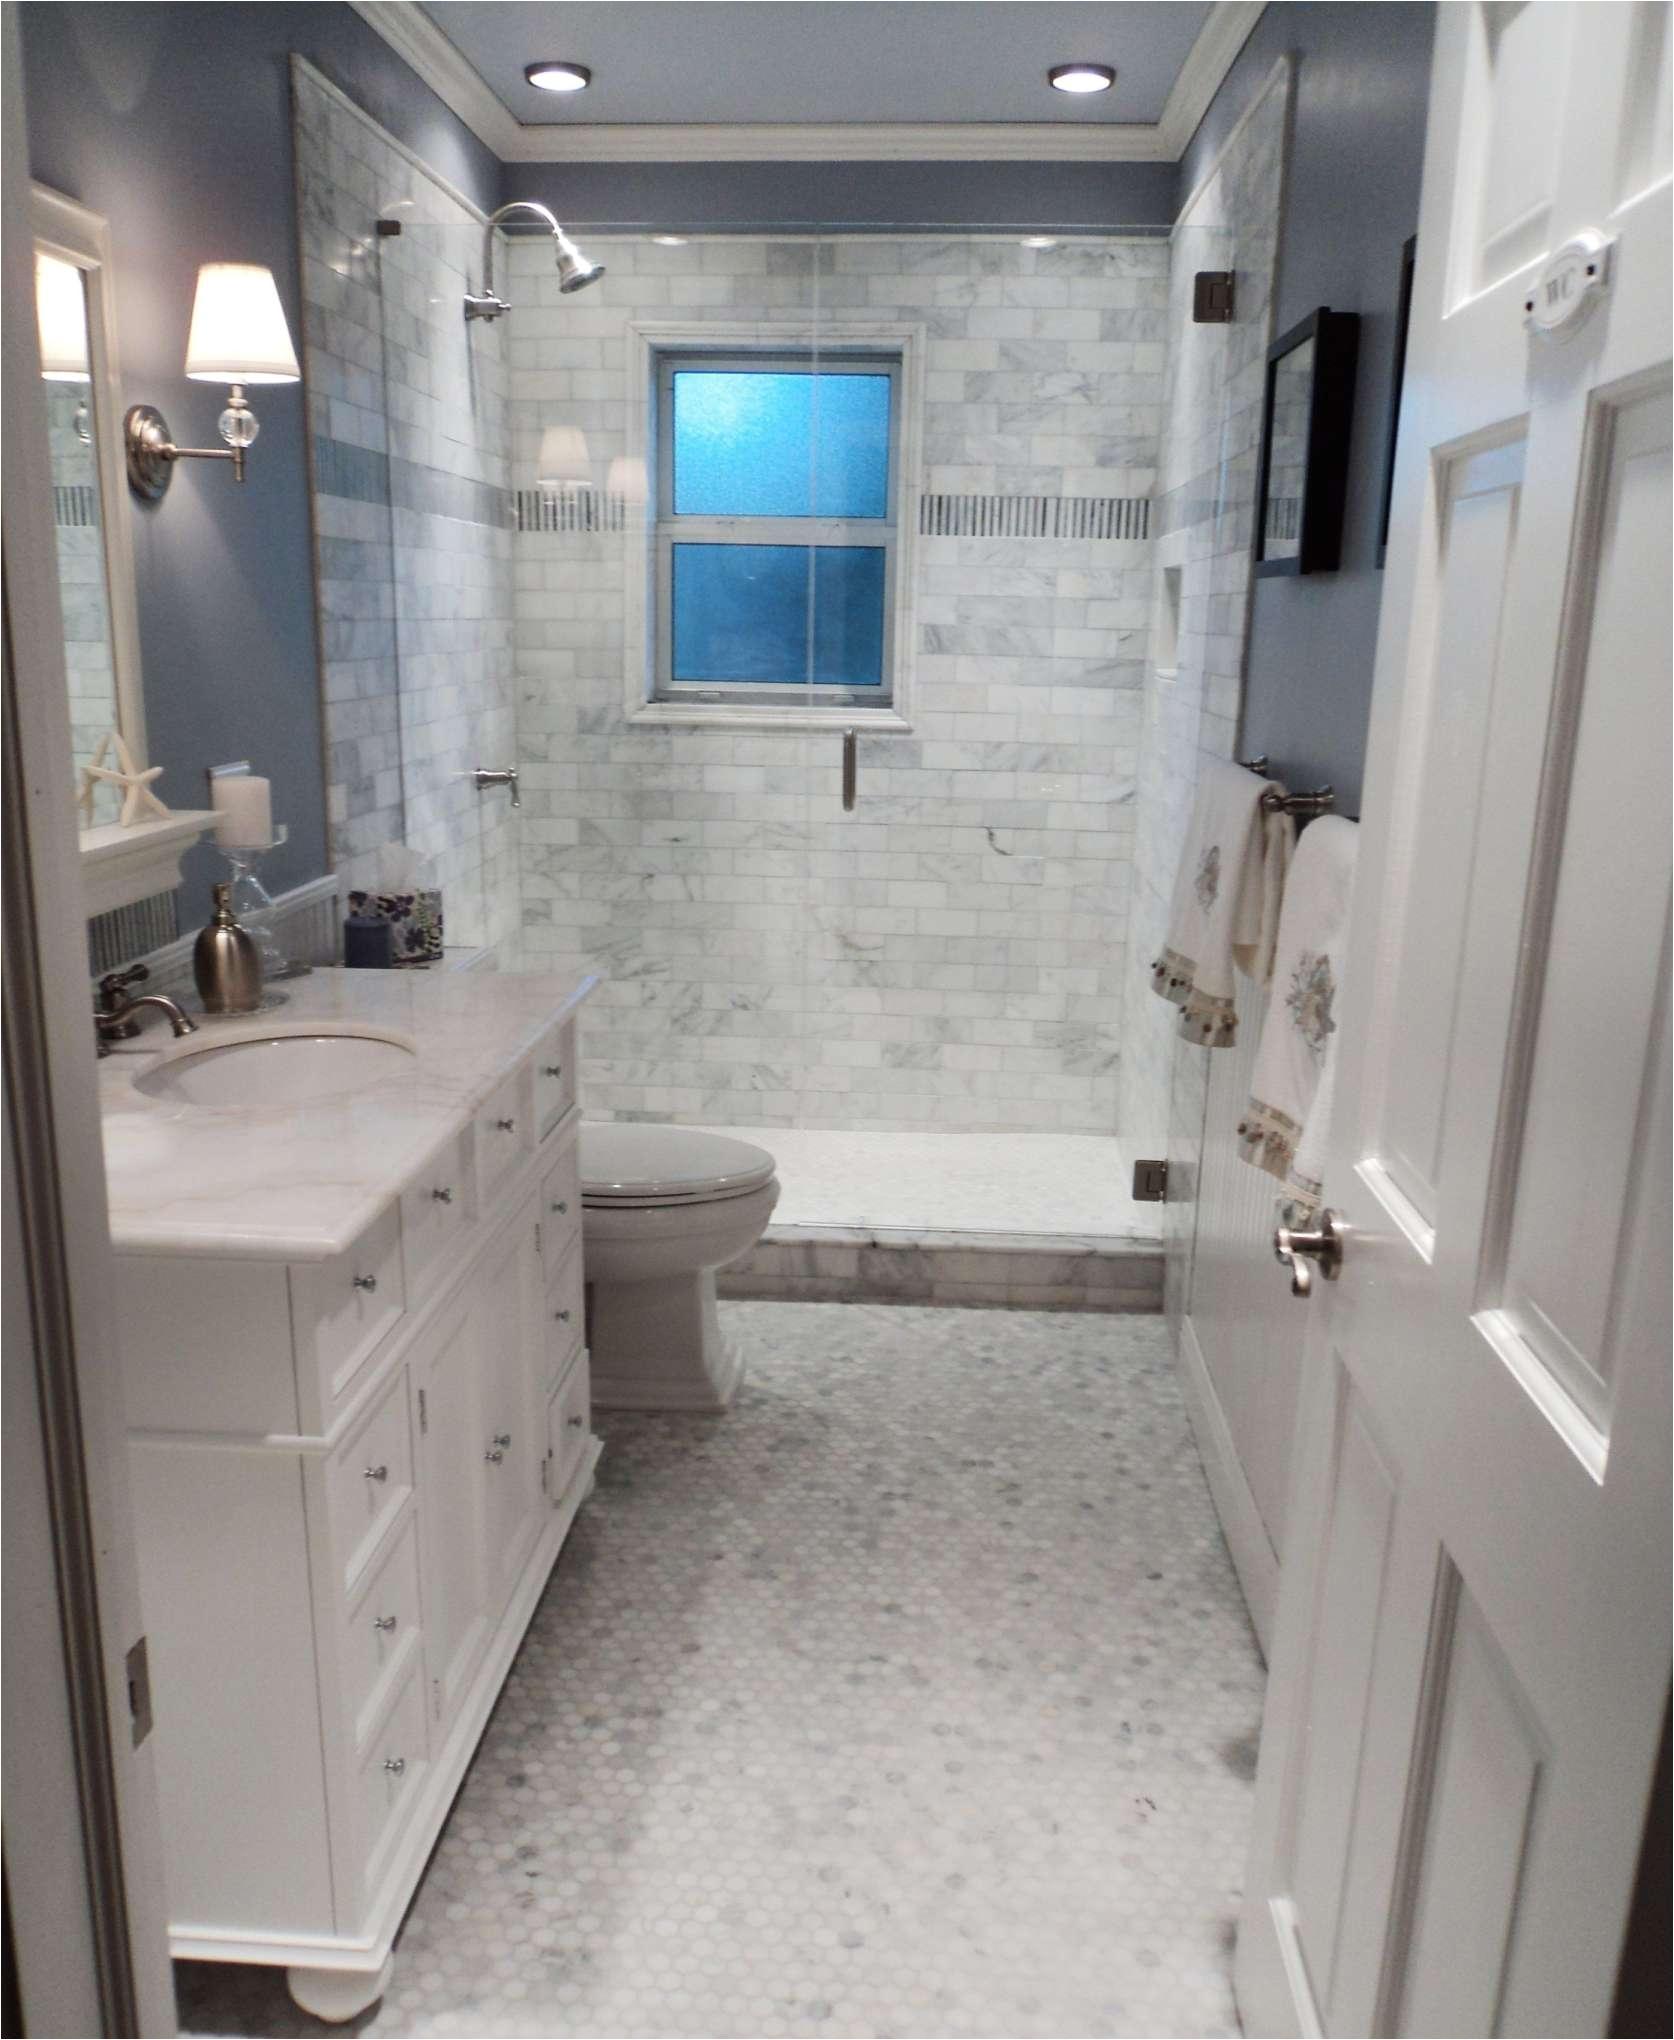 Amazing Japanese Bathroom Design And Tub Shower Ideas For Small Bathrooms I Pinimg Originals 0d C4 9b